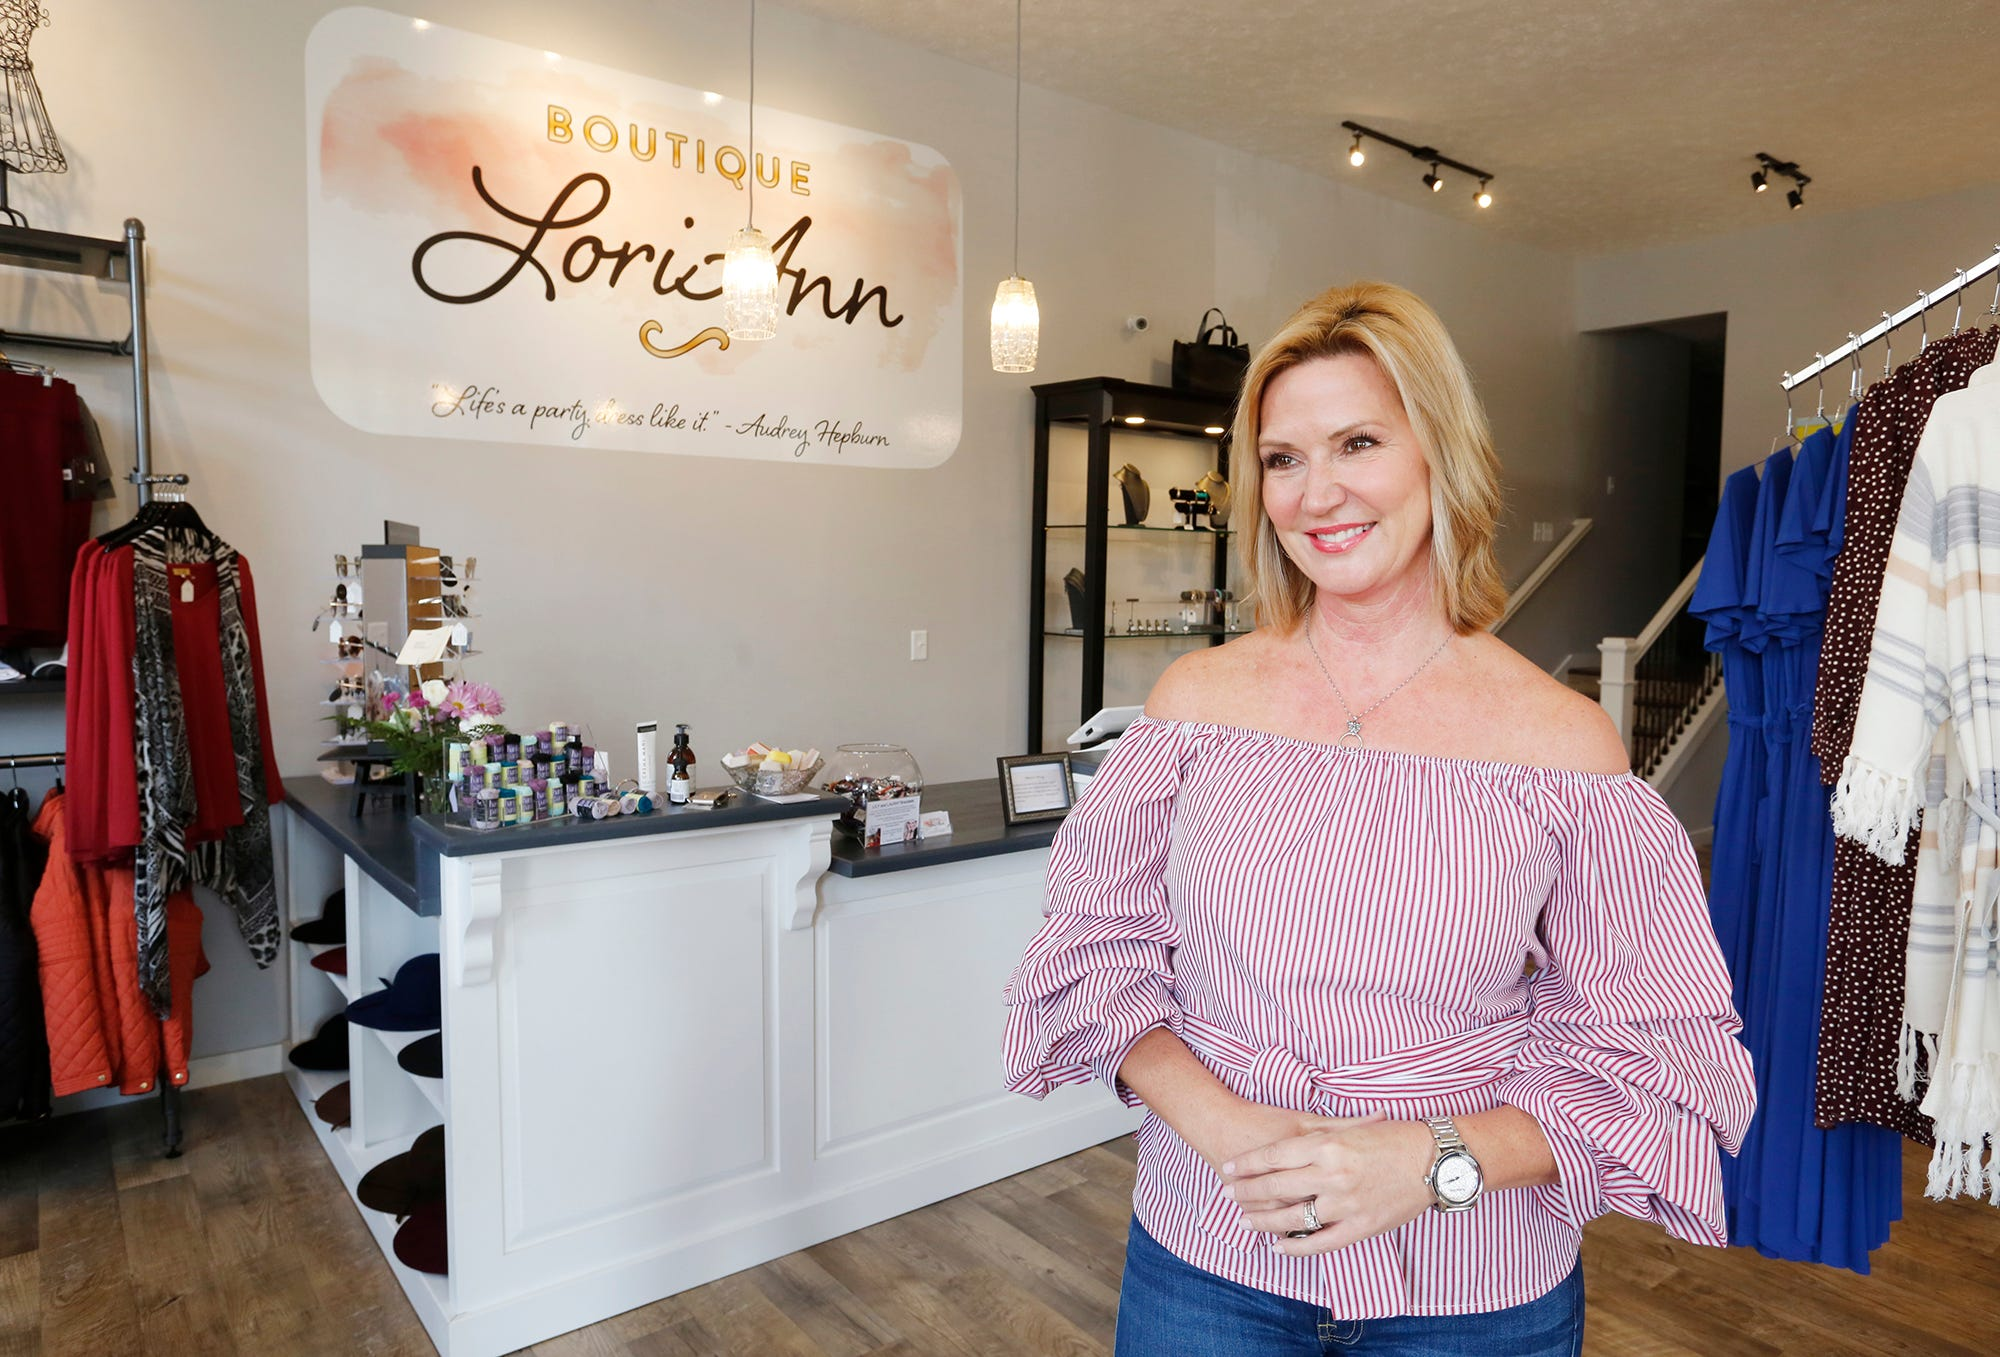 Laf Boutique Lori Ann